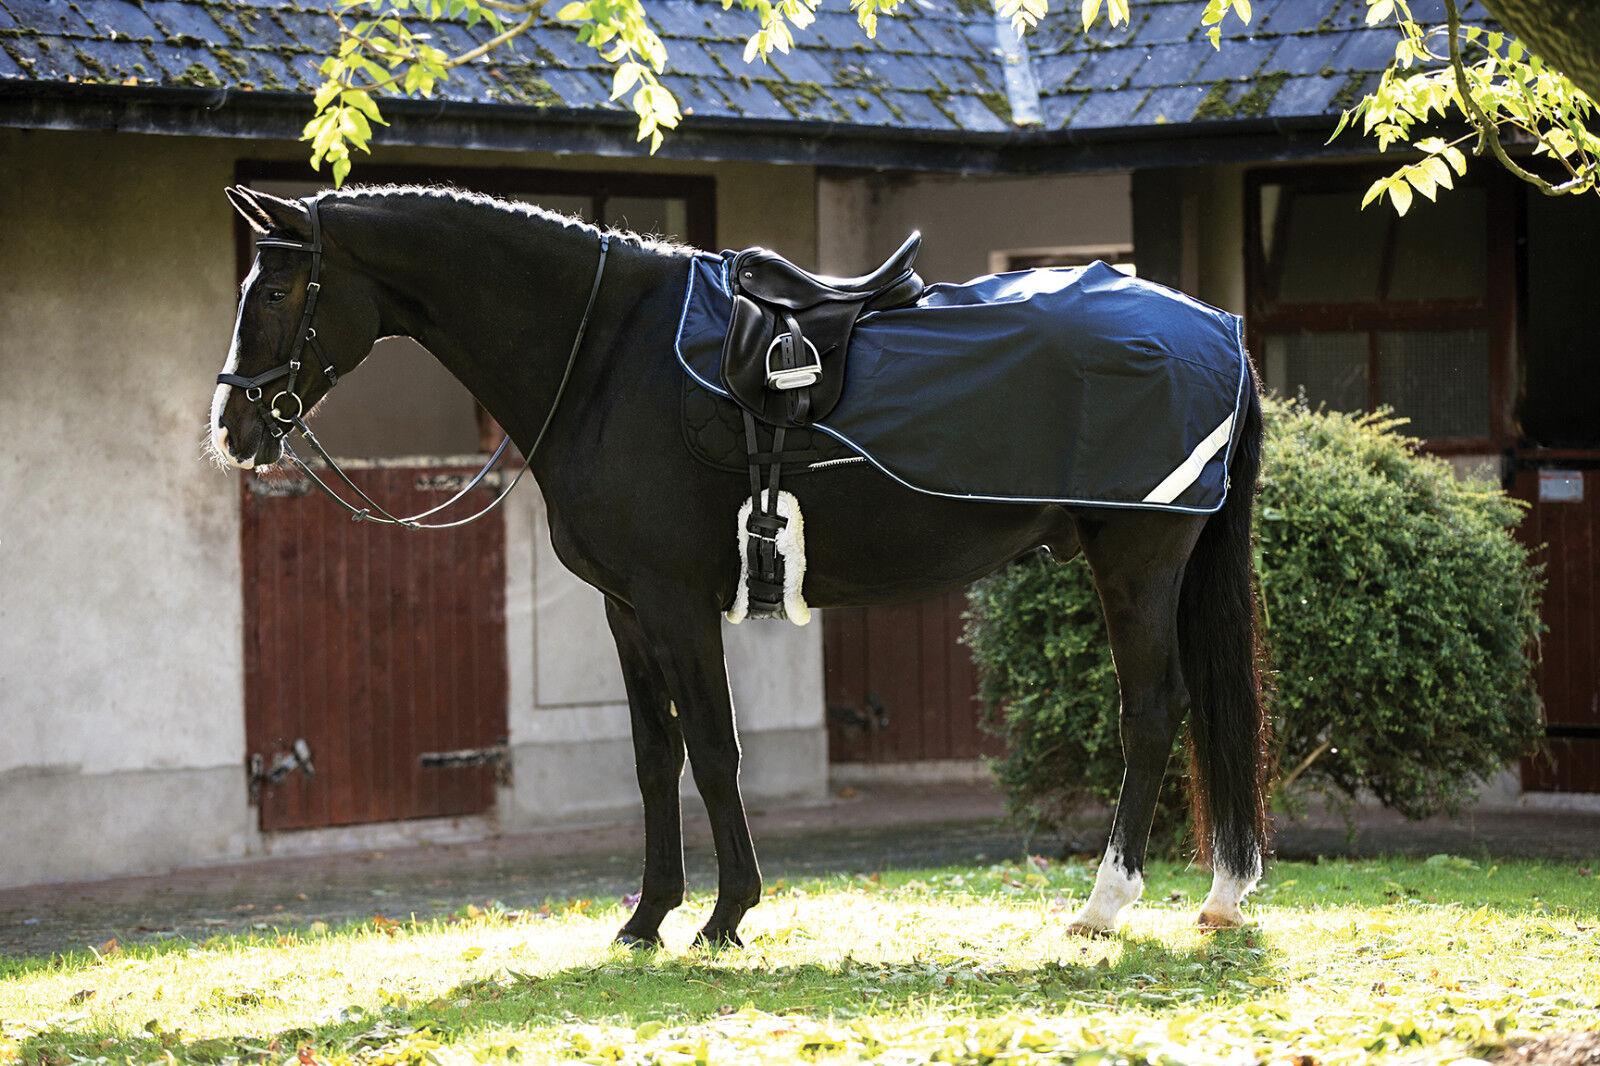 Horseware Amigo S/M/L/XL COMPETITION Waterproof Exercise Sheet Rug Navy/Choc/ROT S/M/L/XL Amigo b8866c